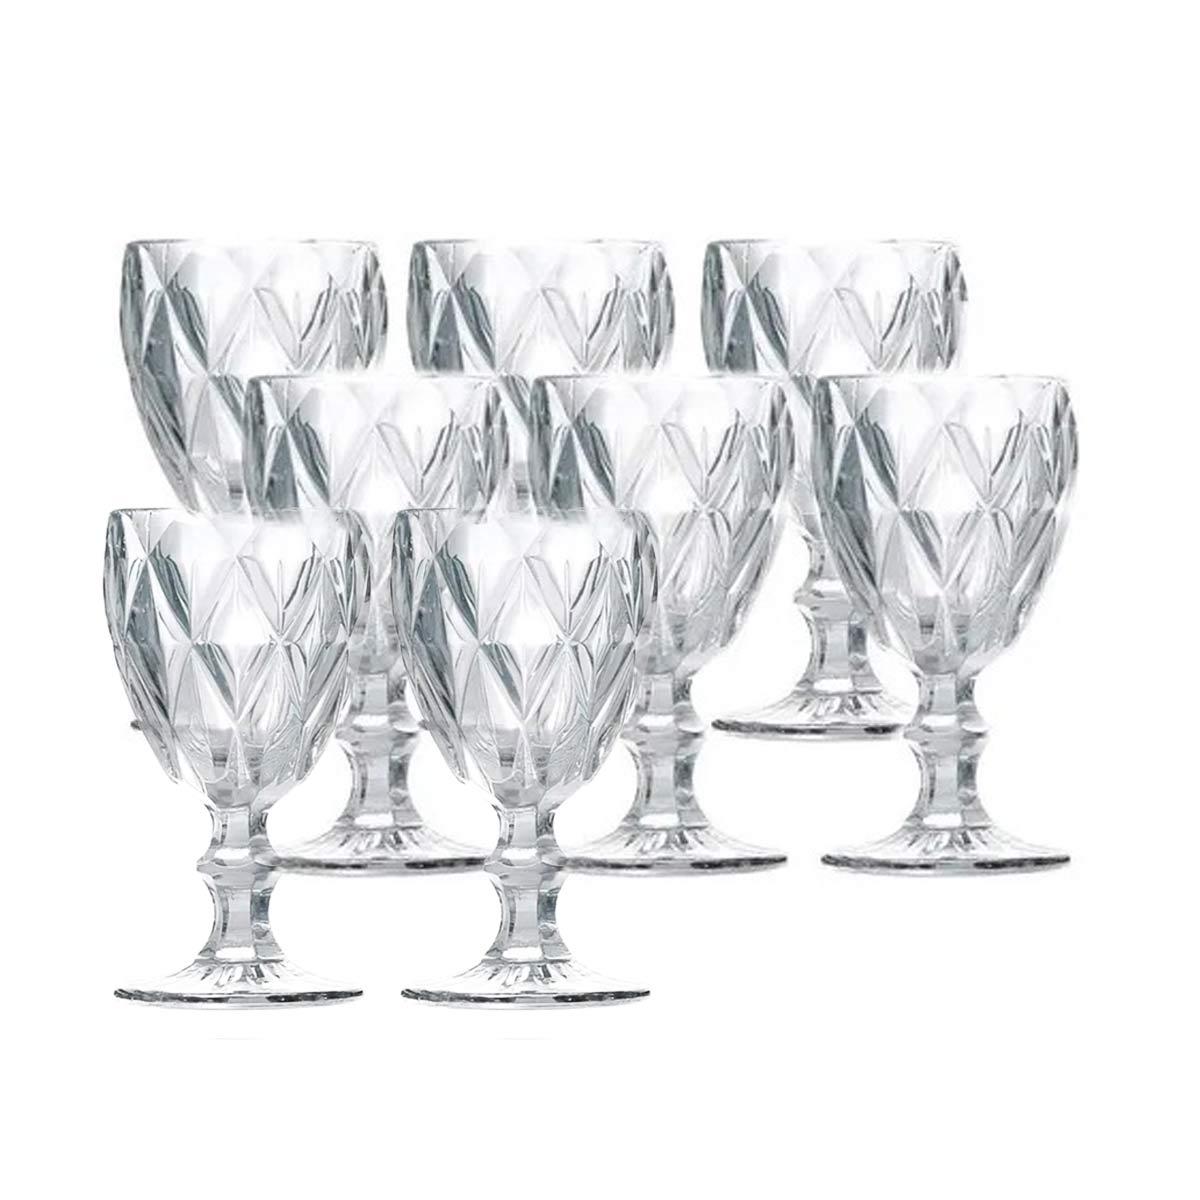 Jogo 8 Taças para Água Vidro Sodo Cálcico Diamond Transparente Lyor 325 ml  - Lemis